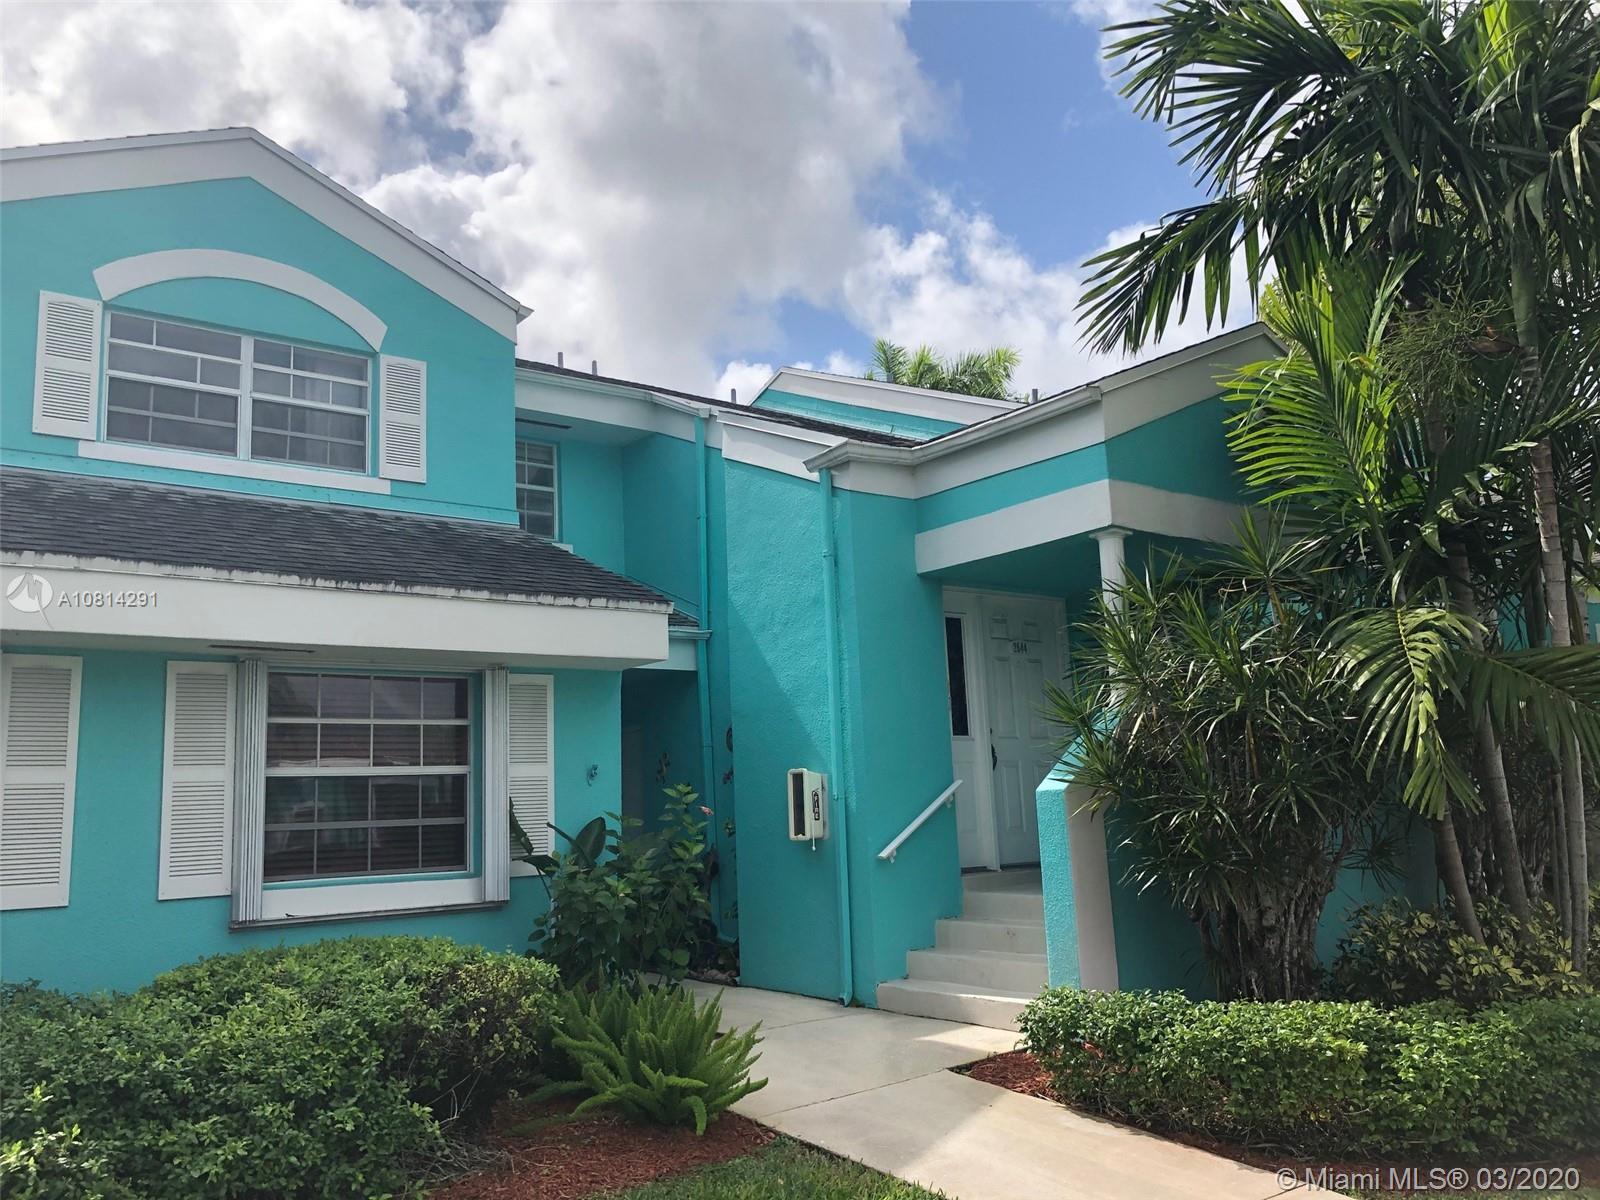 2644 SE 20th Ct #201-D, Homestead, FL 33035 - Homestead, FL real estate listing